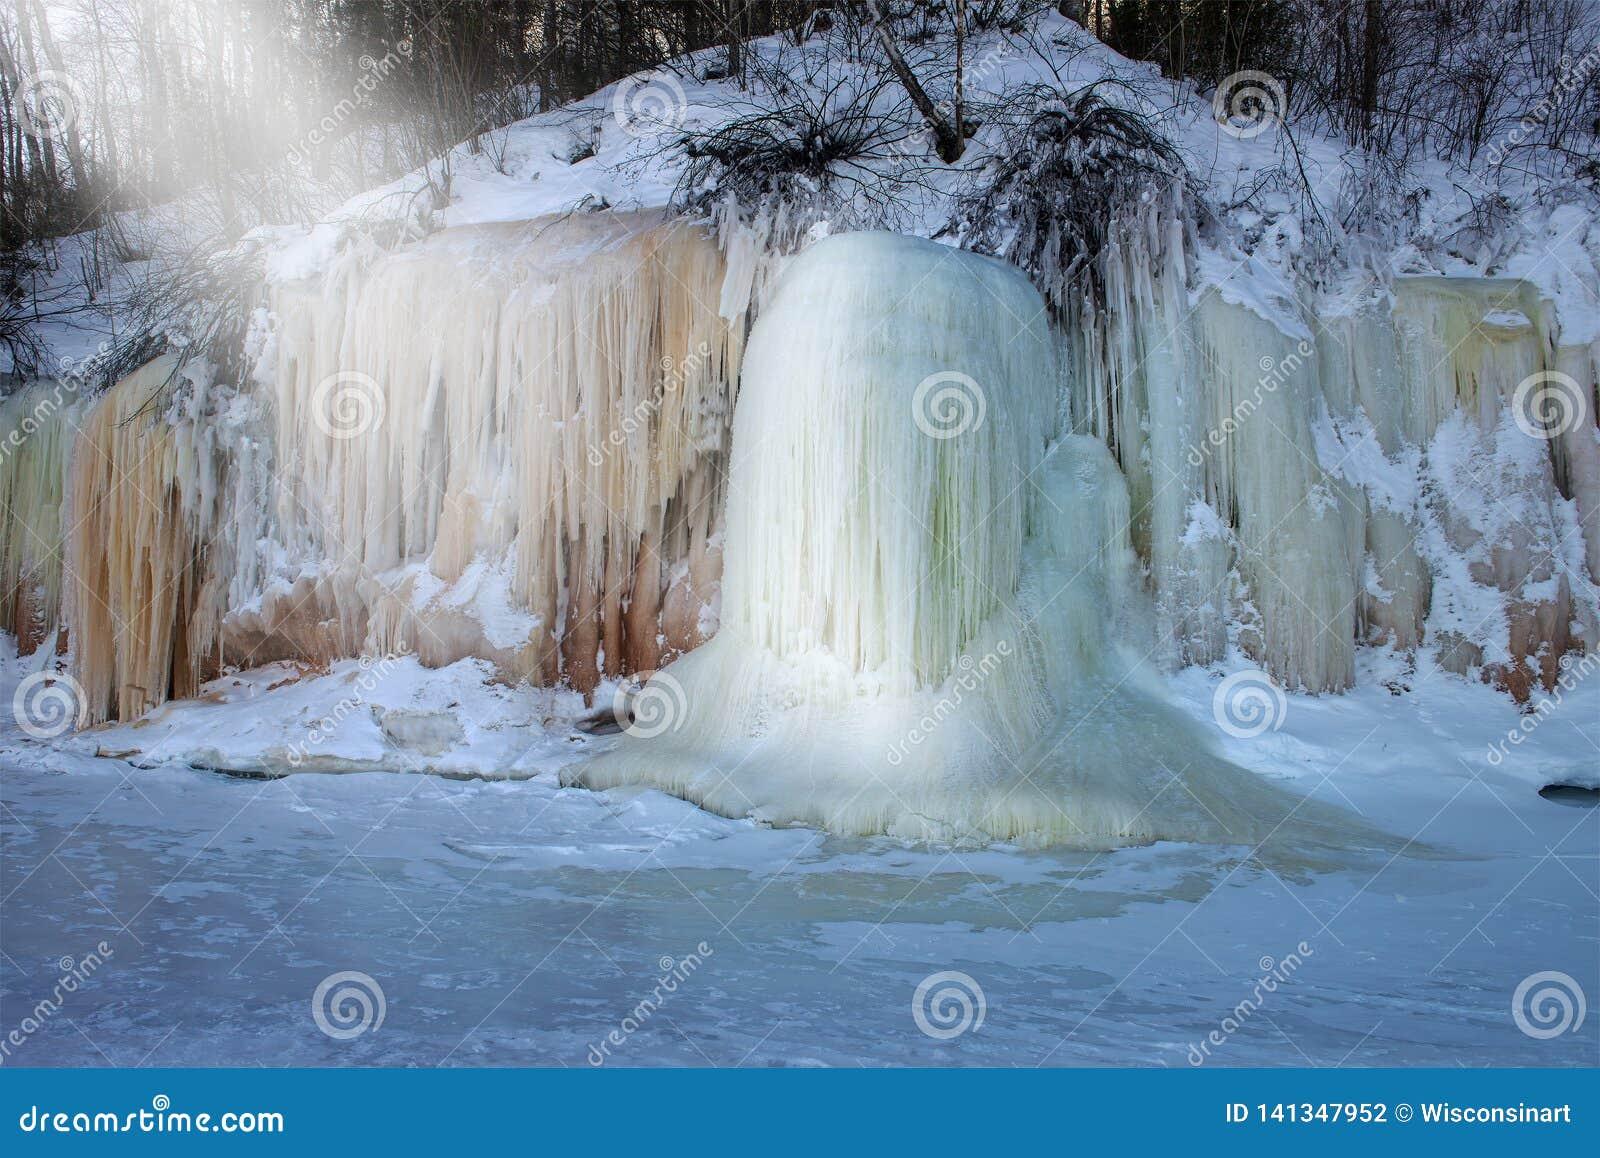 Apostle Islands Ice Caves, Winter, Travel Wisconsin